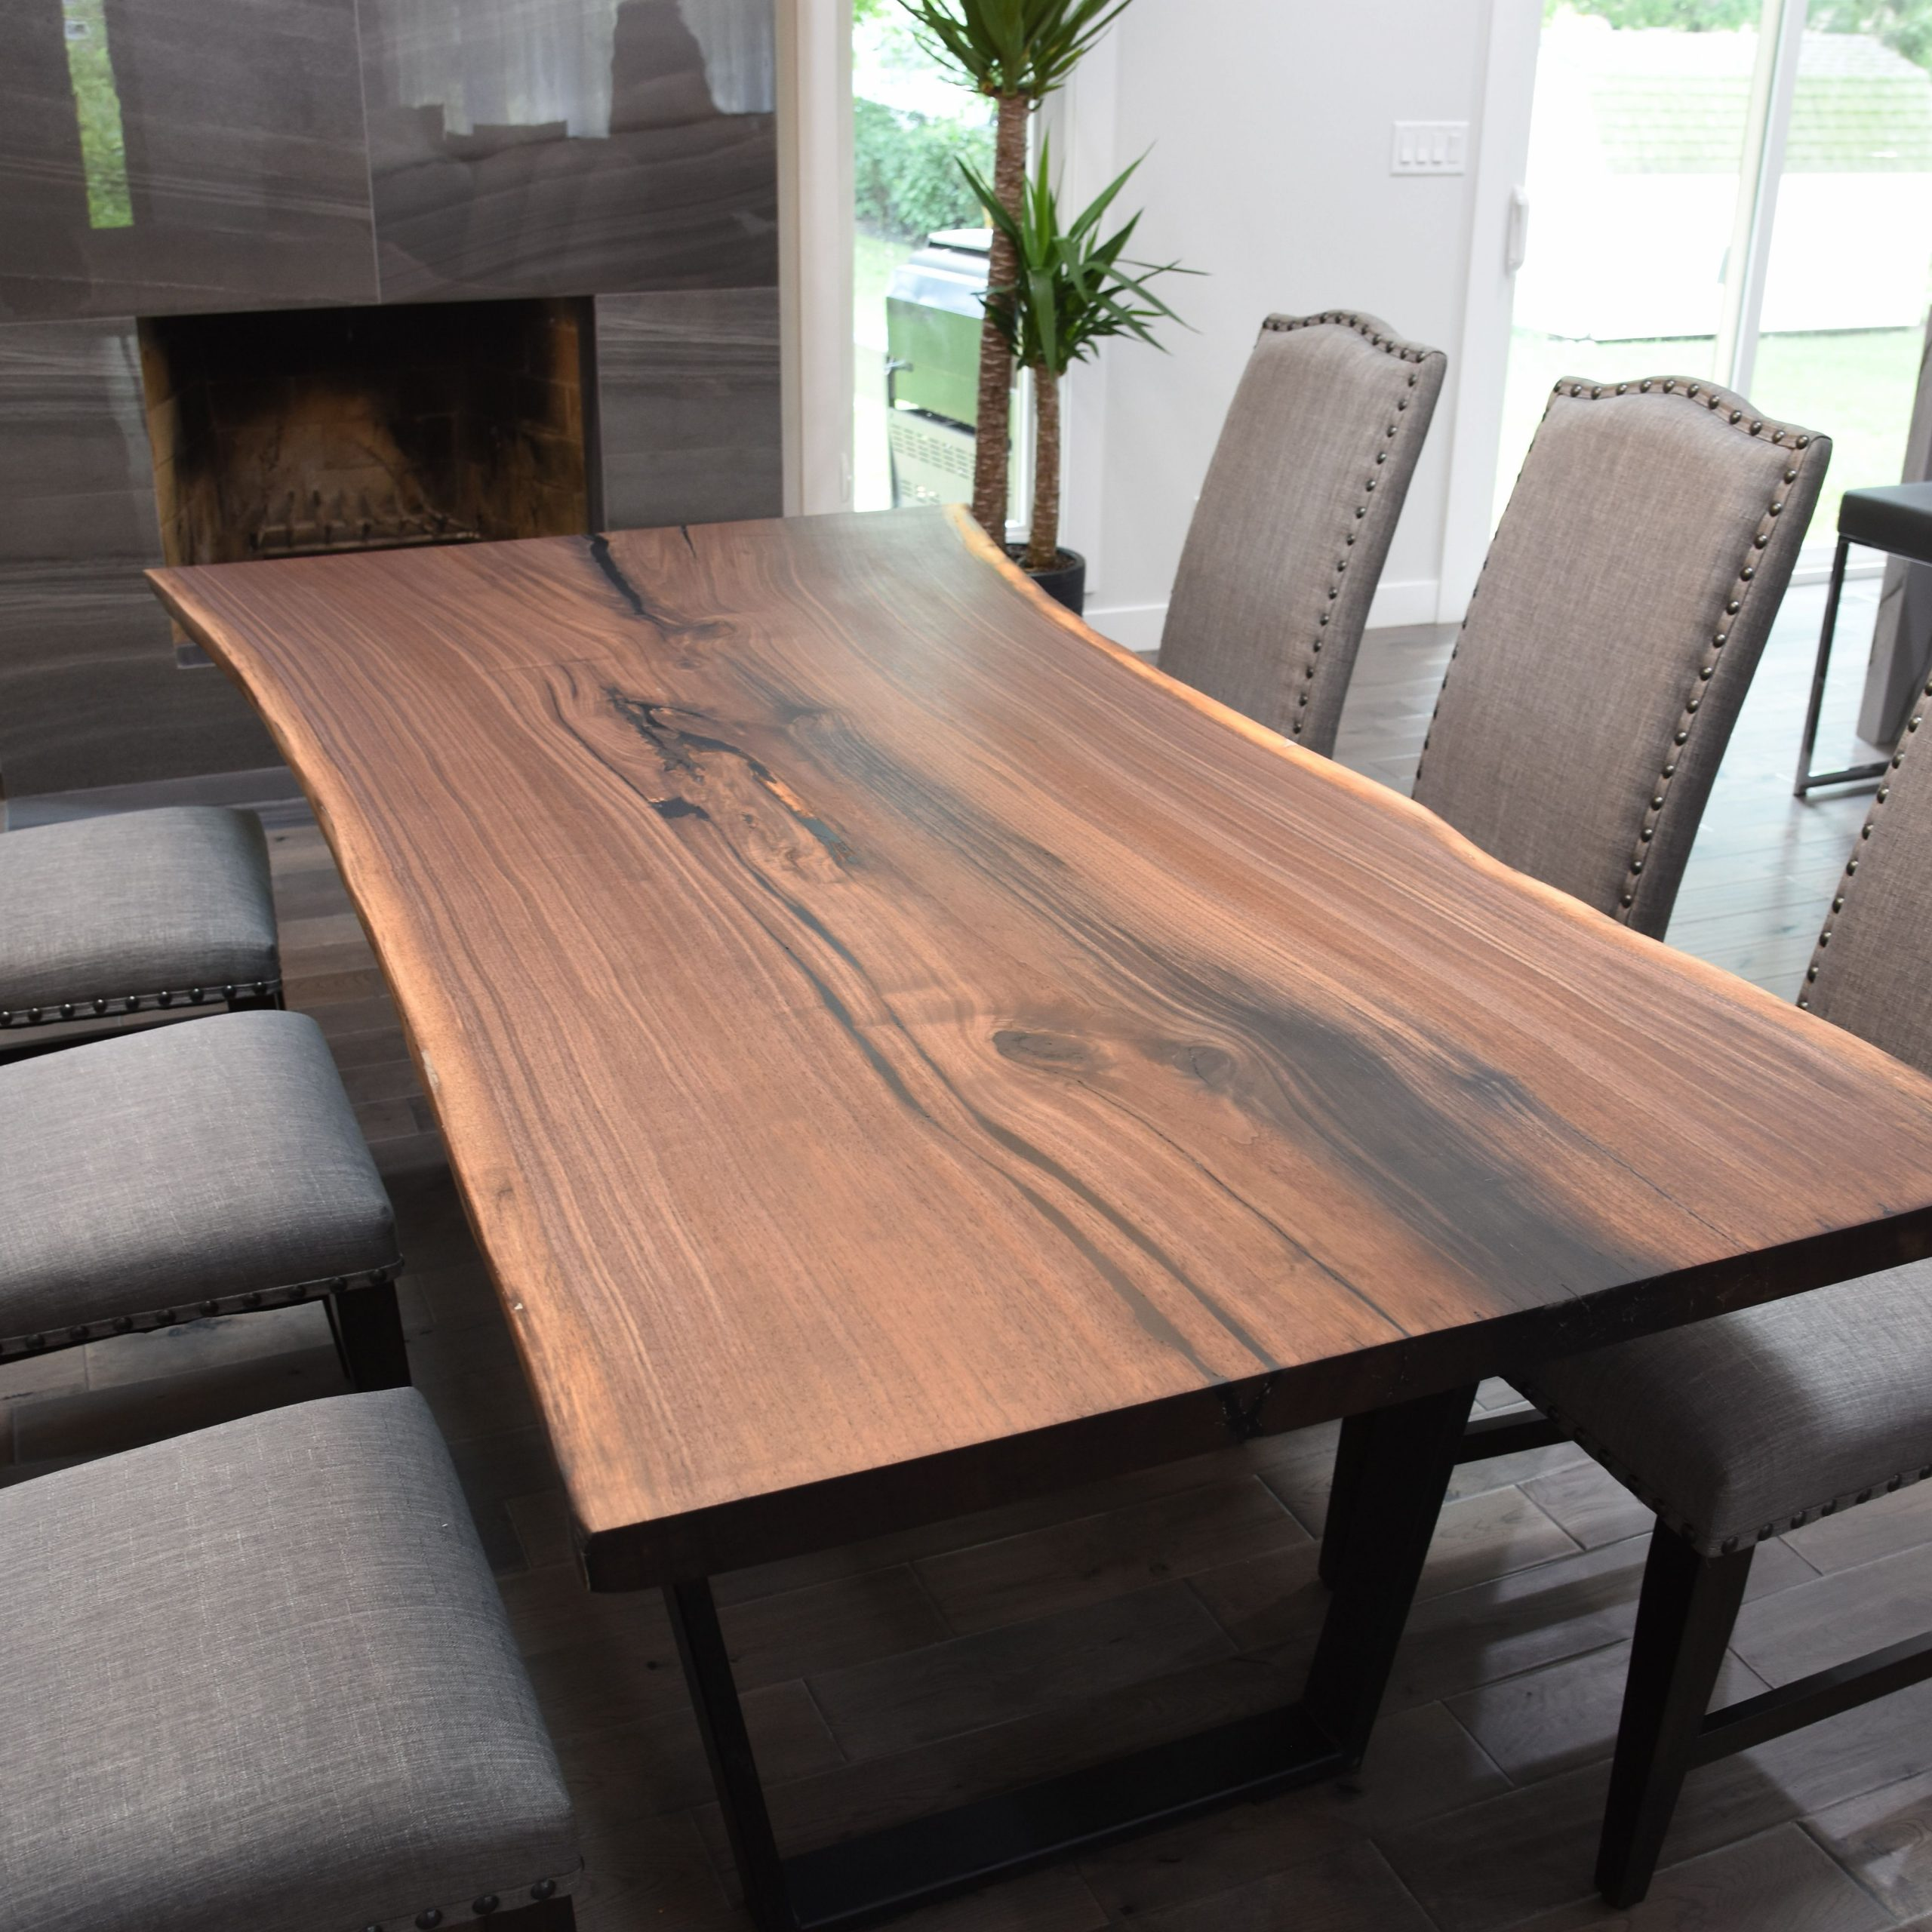 Famous Buy A Custom Single Slab Black Walnut Live Edge Dining Table Regarding Walnut Finish Live Edge Wood Contemporary Dining Tables (View 9 of 25)